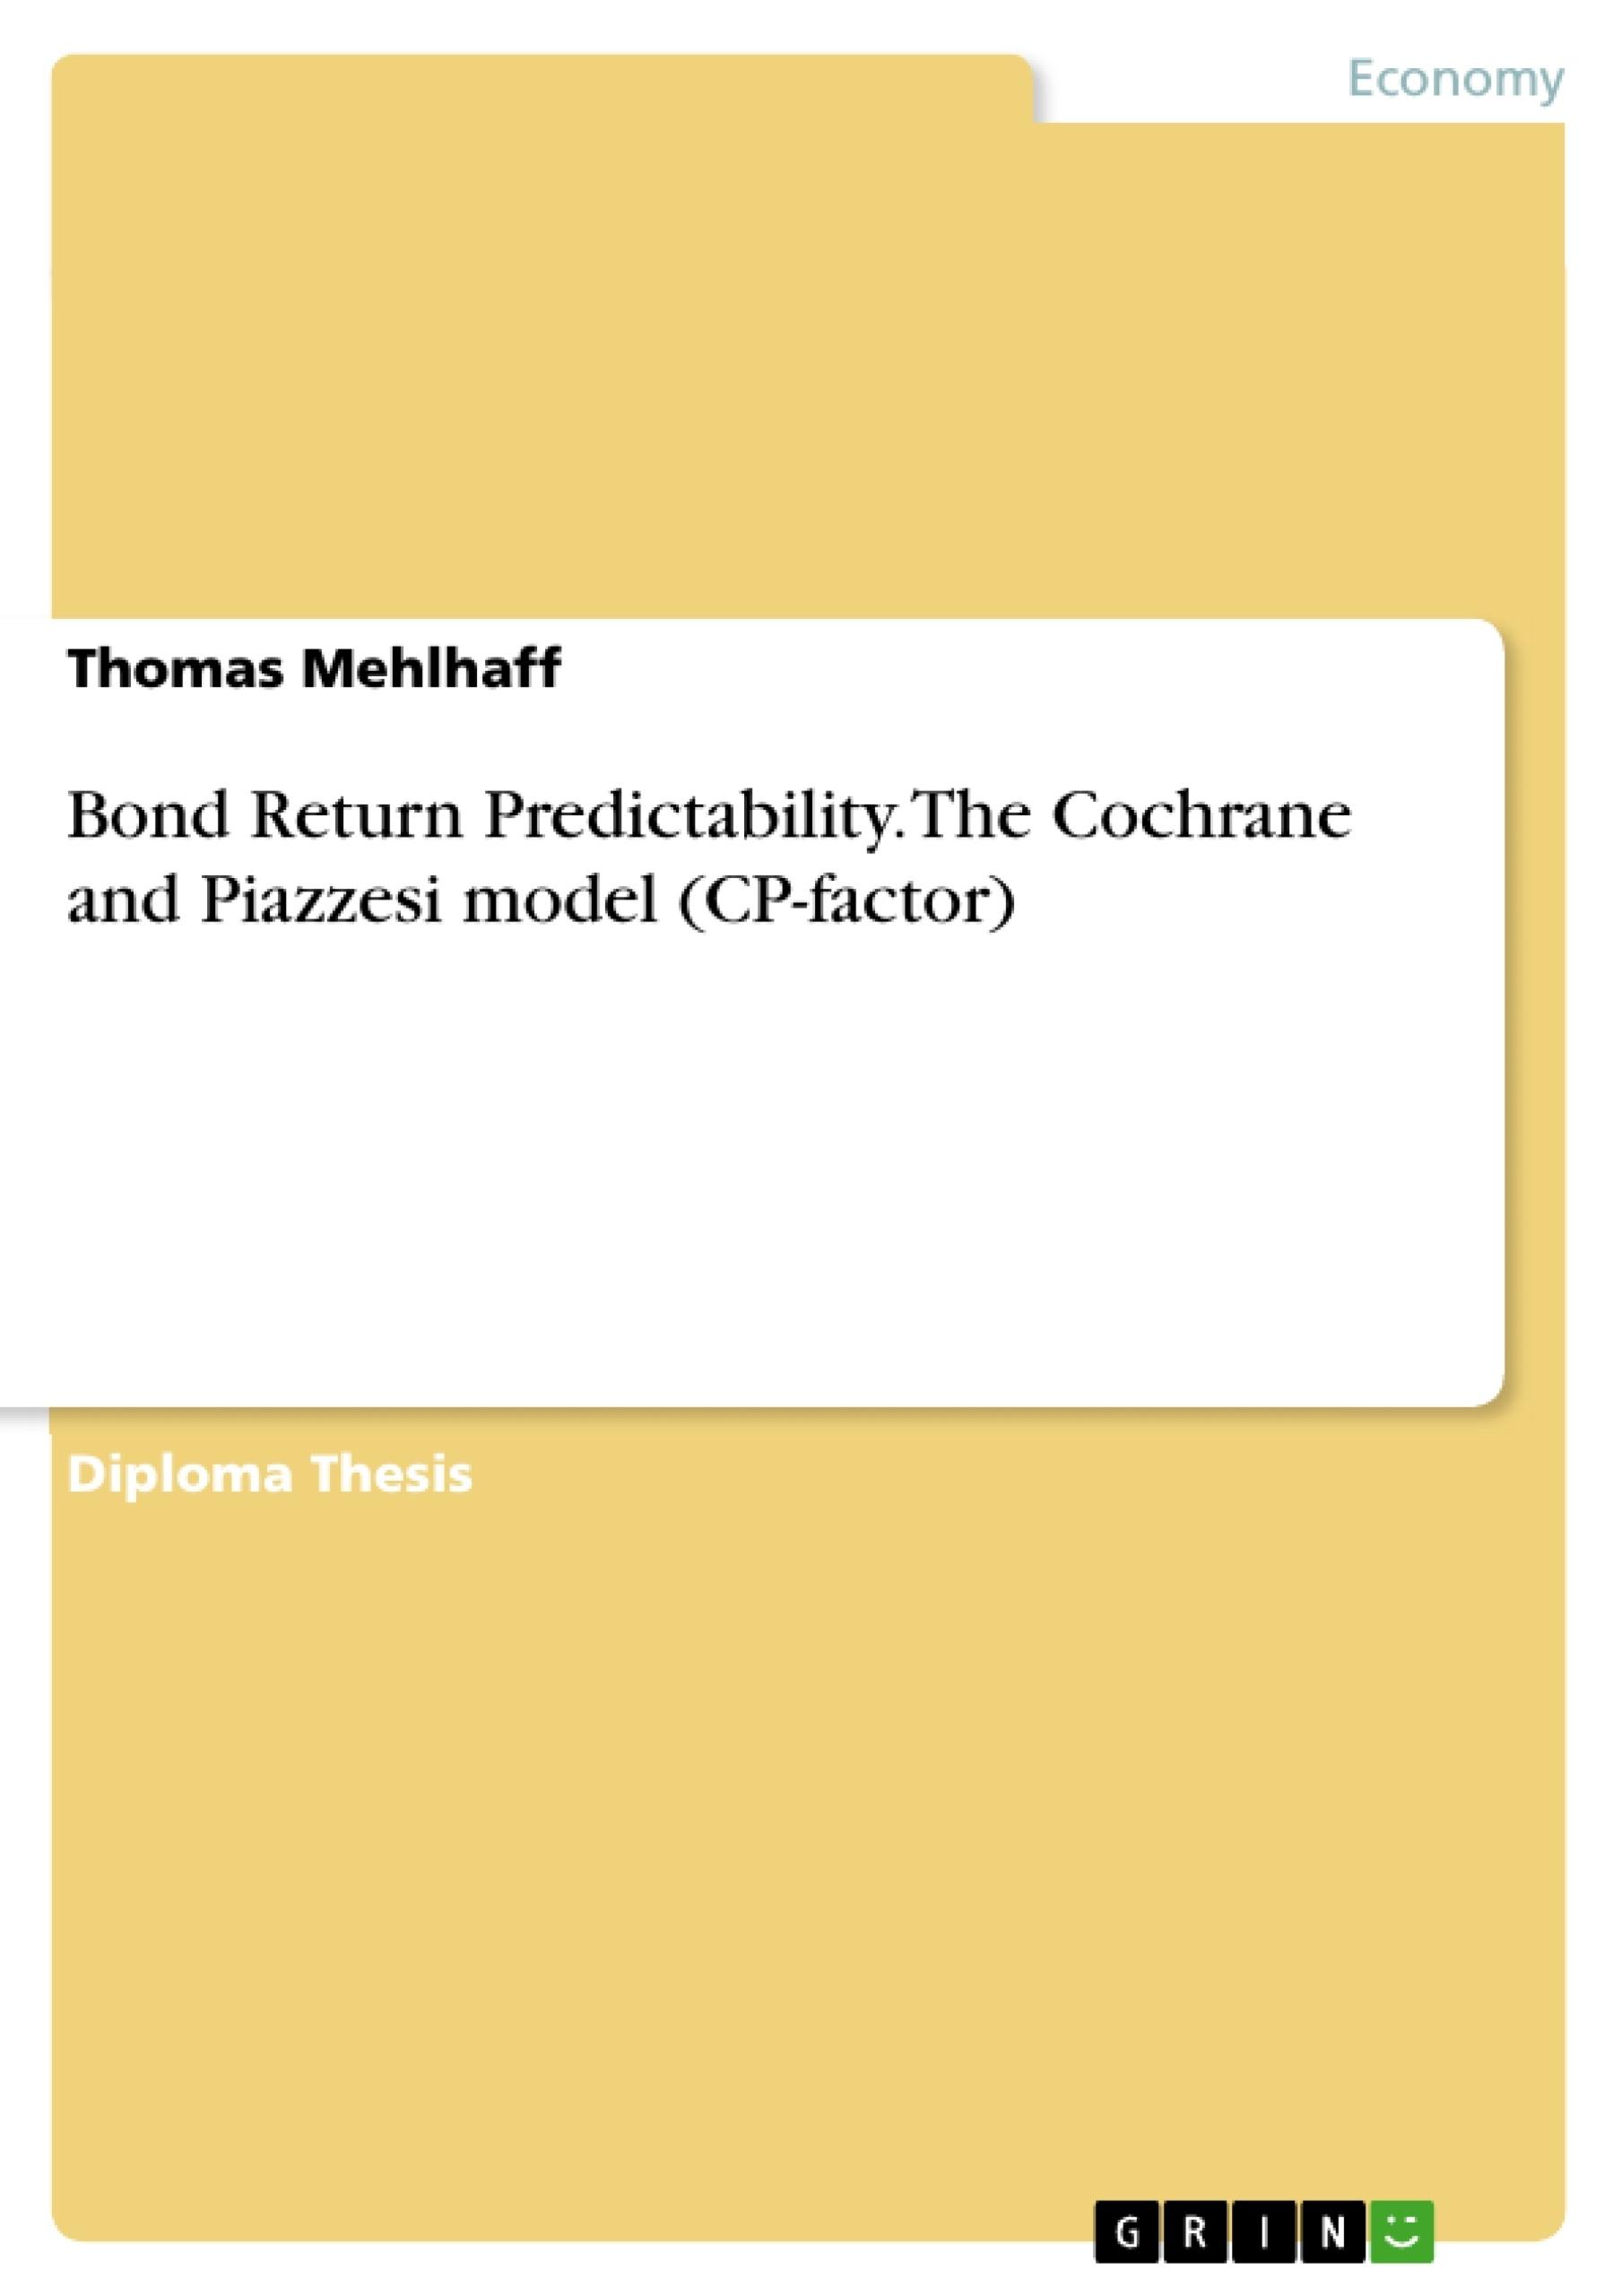 Title: Bond Return Predictability. The Cochrane and Piazzesi model (CP-factor)